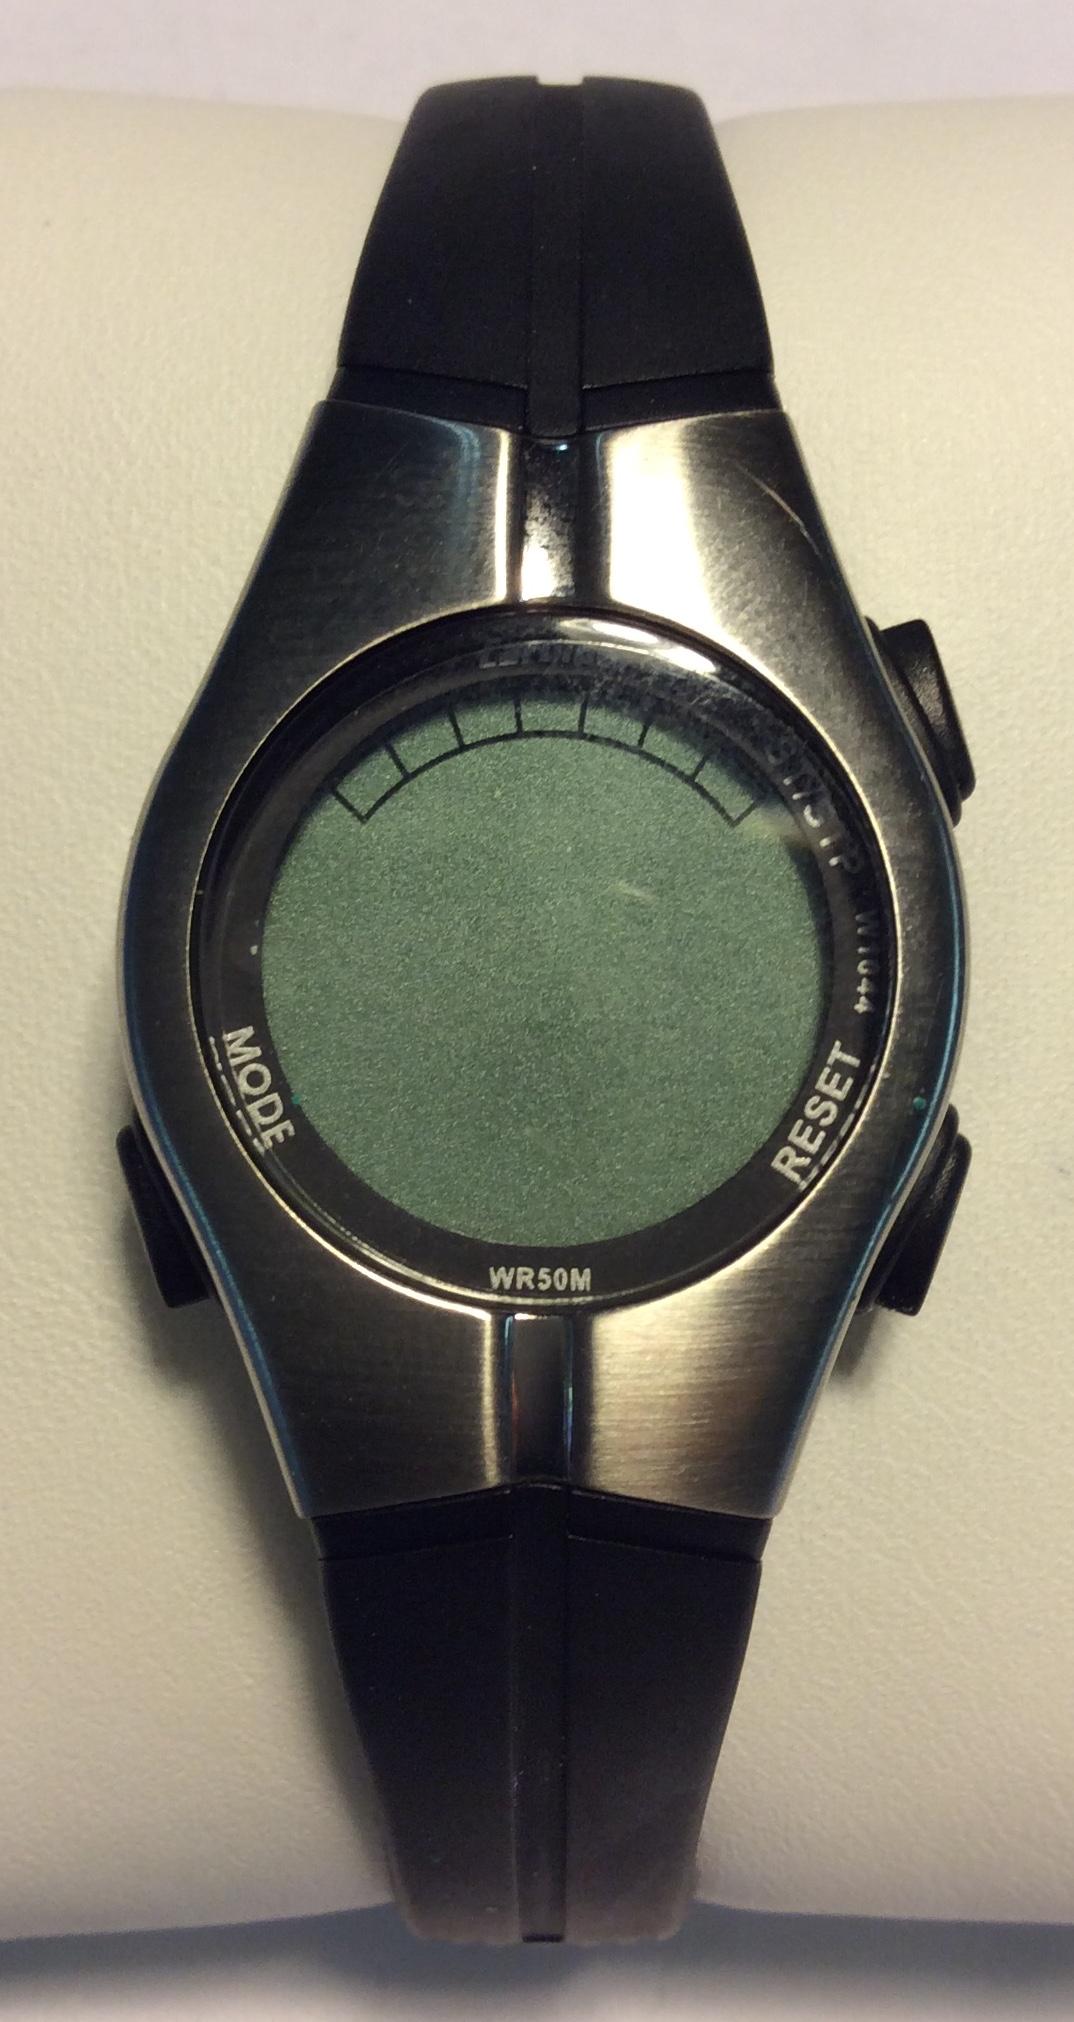 Cardinal watch - round digital face